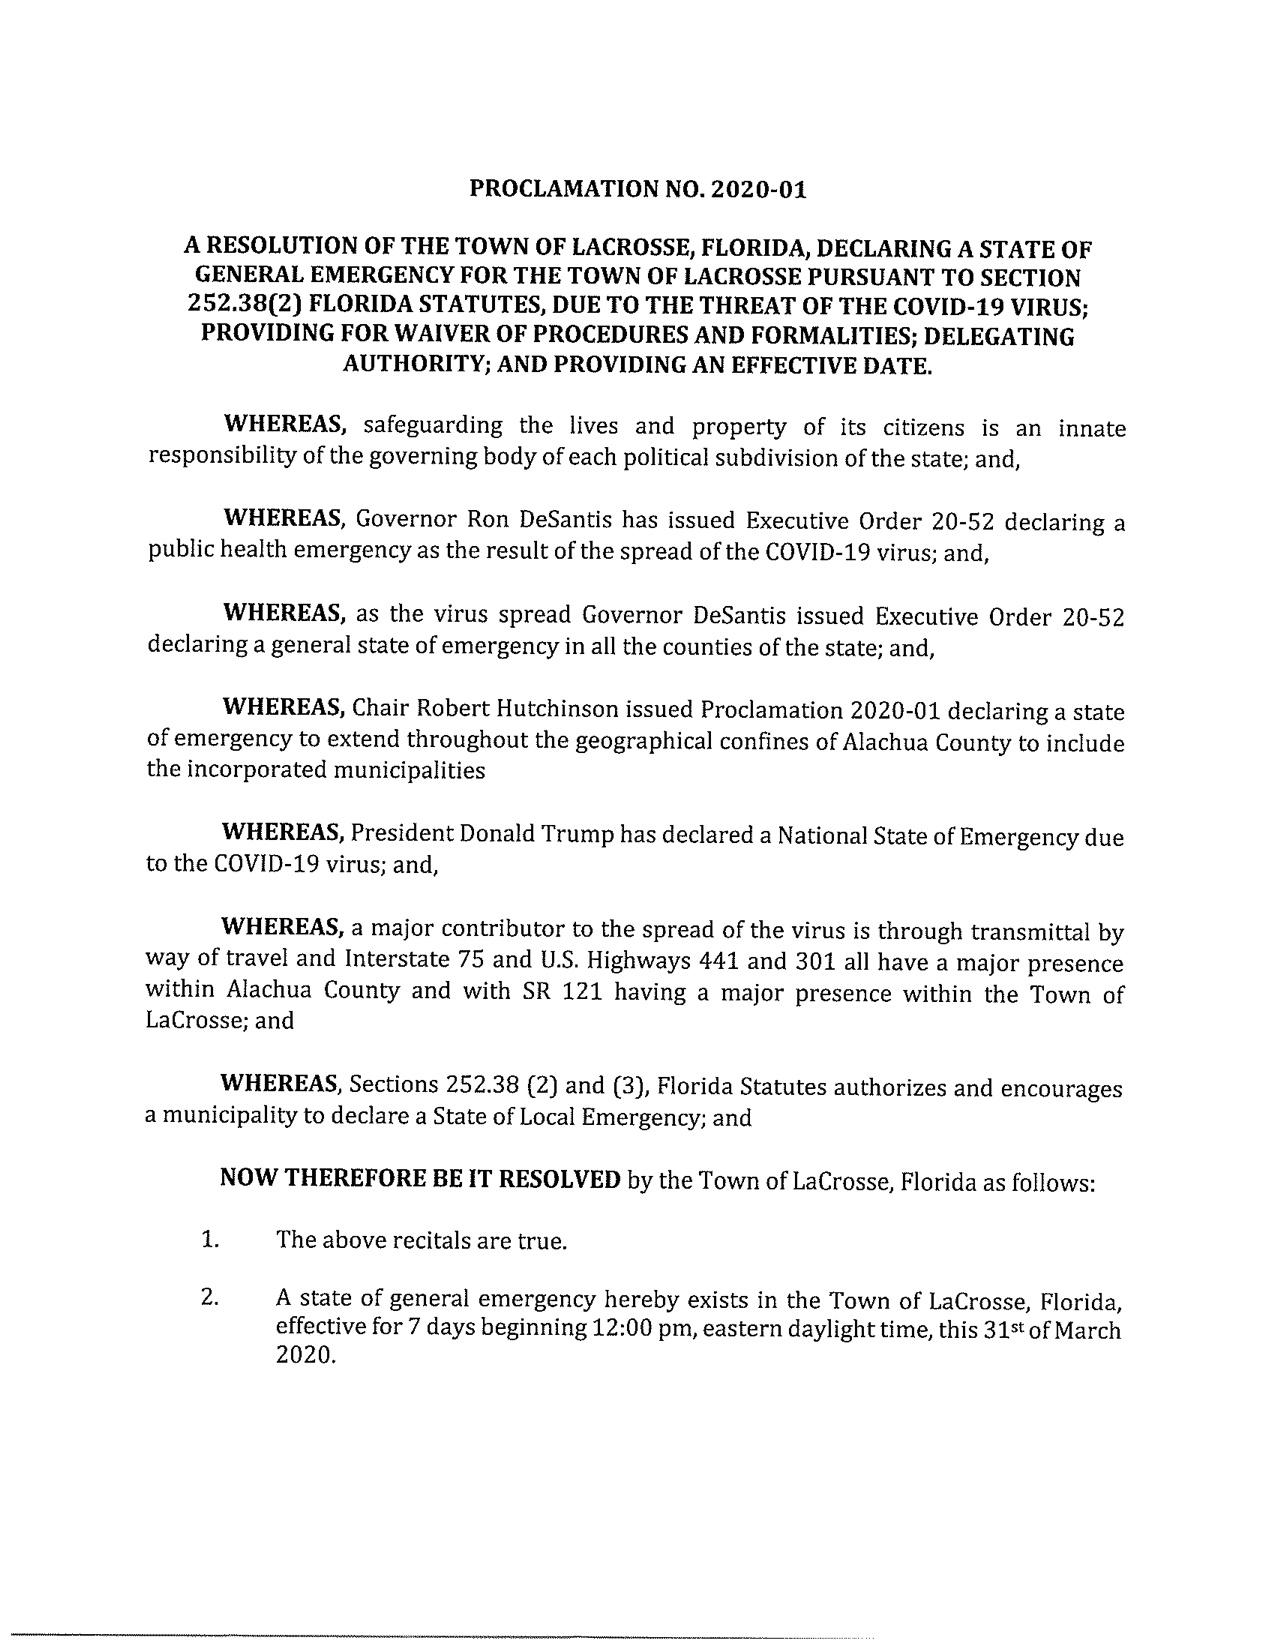 proclamation 2020-01